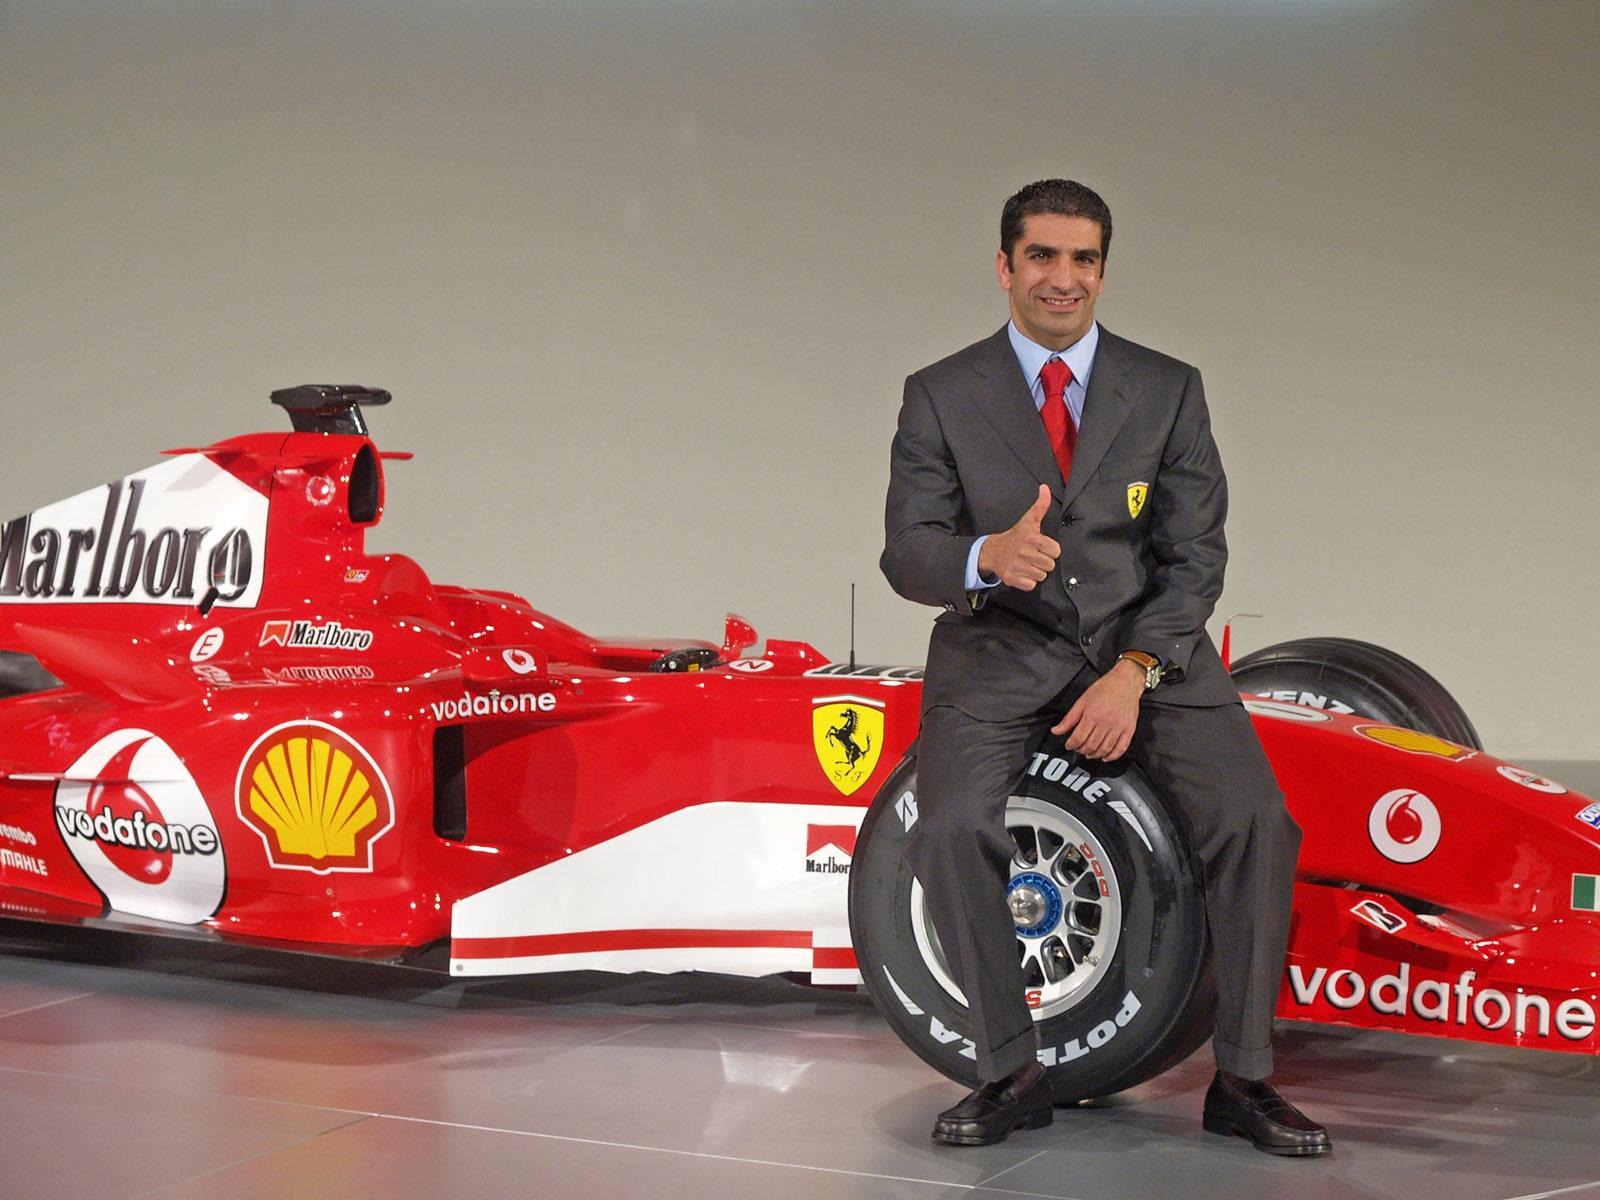 http://3.bp.blogspot.com/-W-c0cZltf2g/TcaV2eieBAI/AAAAAAAAAPg/lV7_wpoFzrk/s1600/Ferrari-F2005-02-1600.jpg